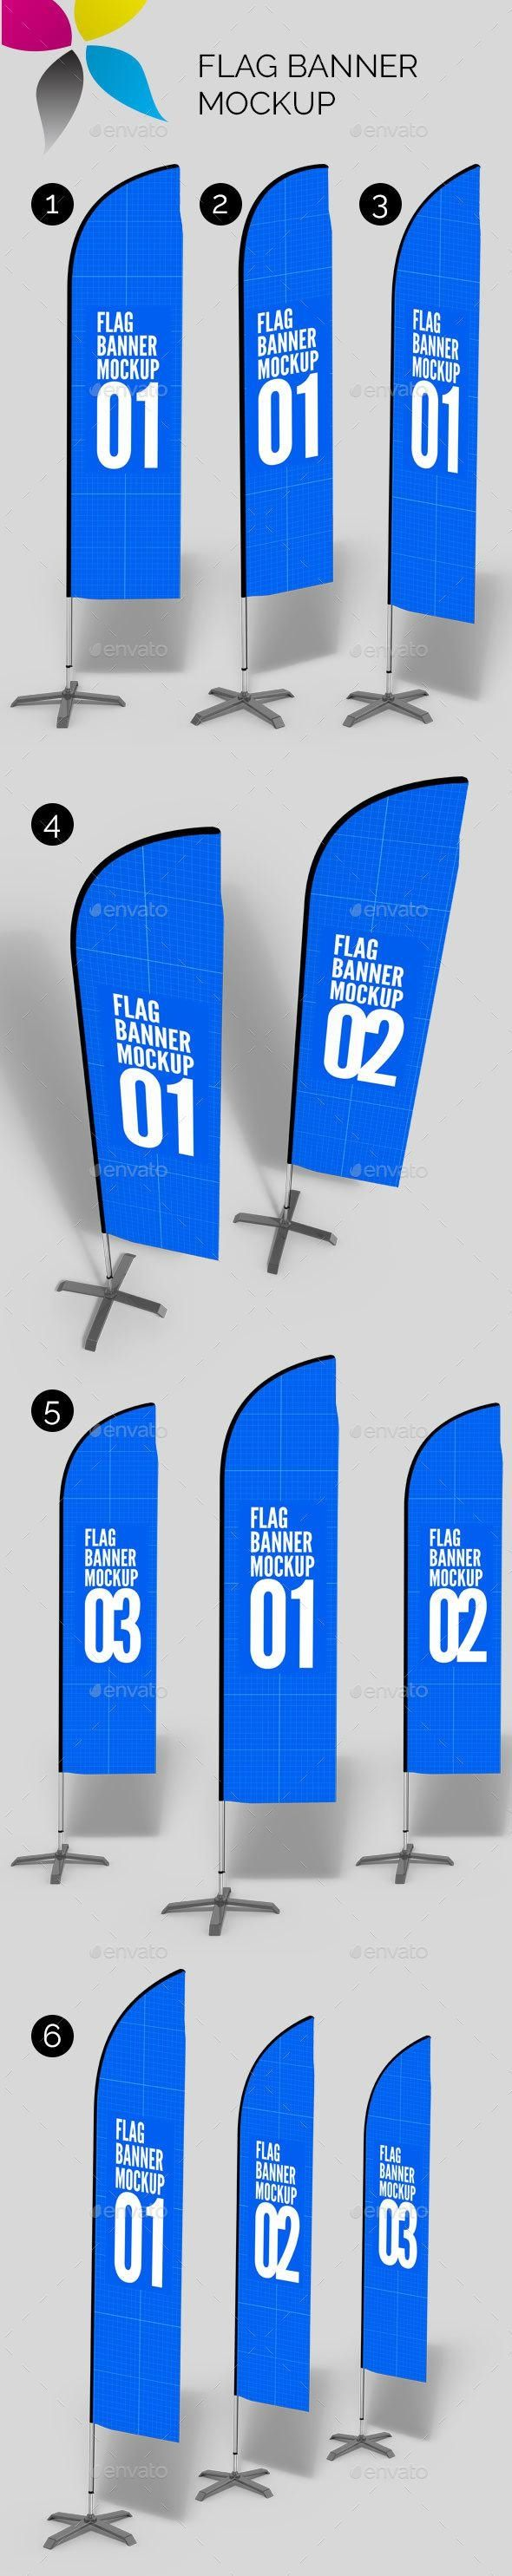 Flag Banner Mockup Flag Banners Graphic Design Templates Mockup Photoshop